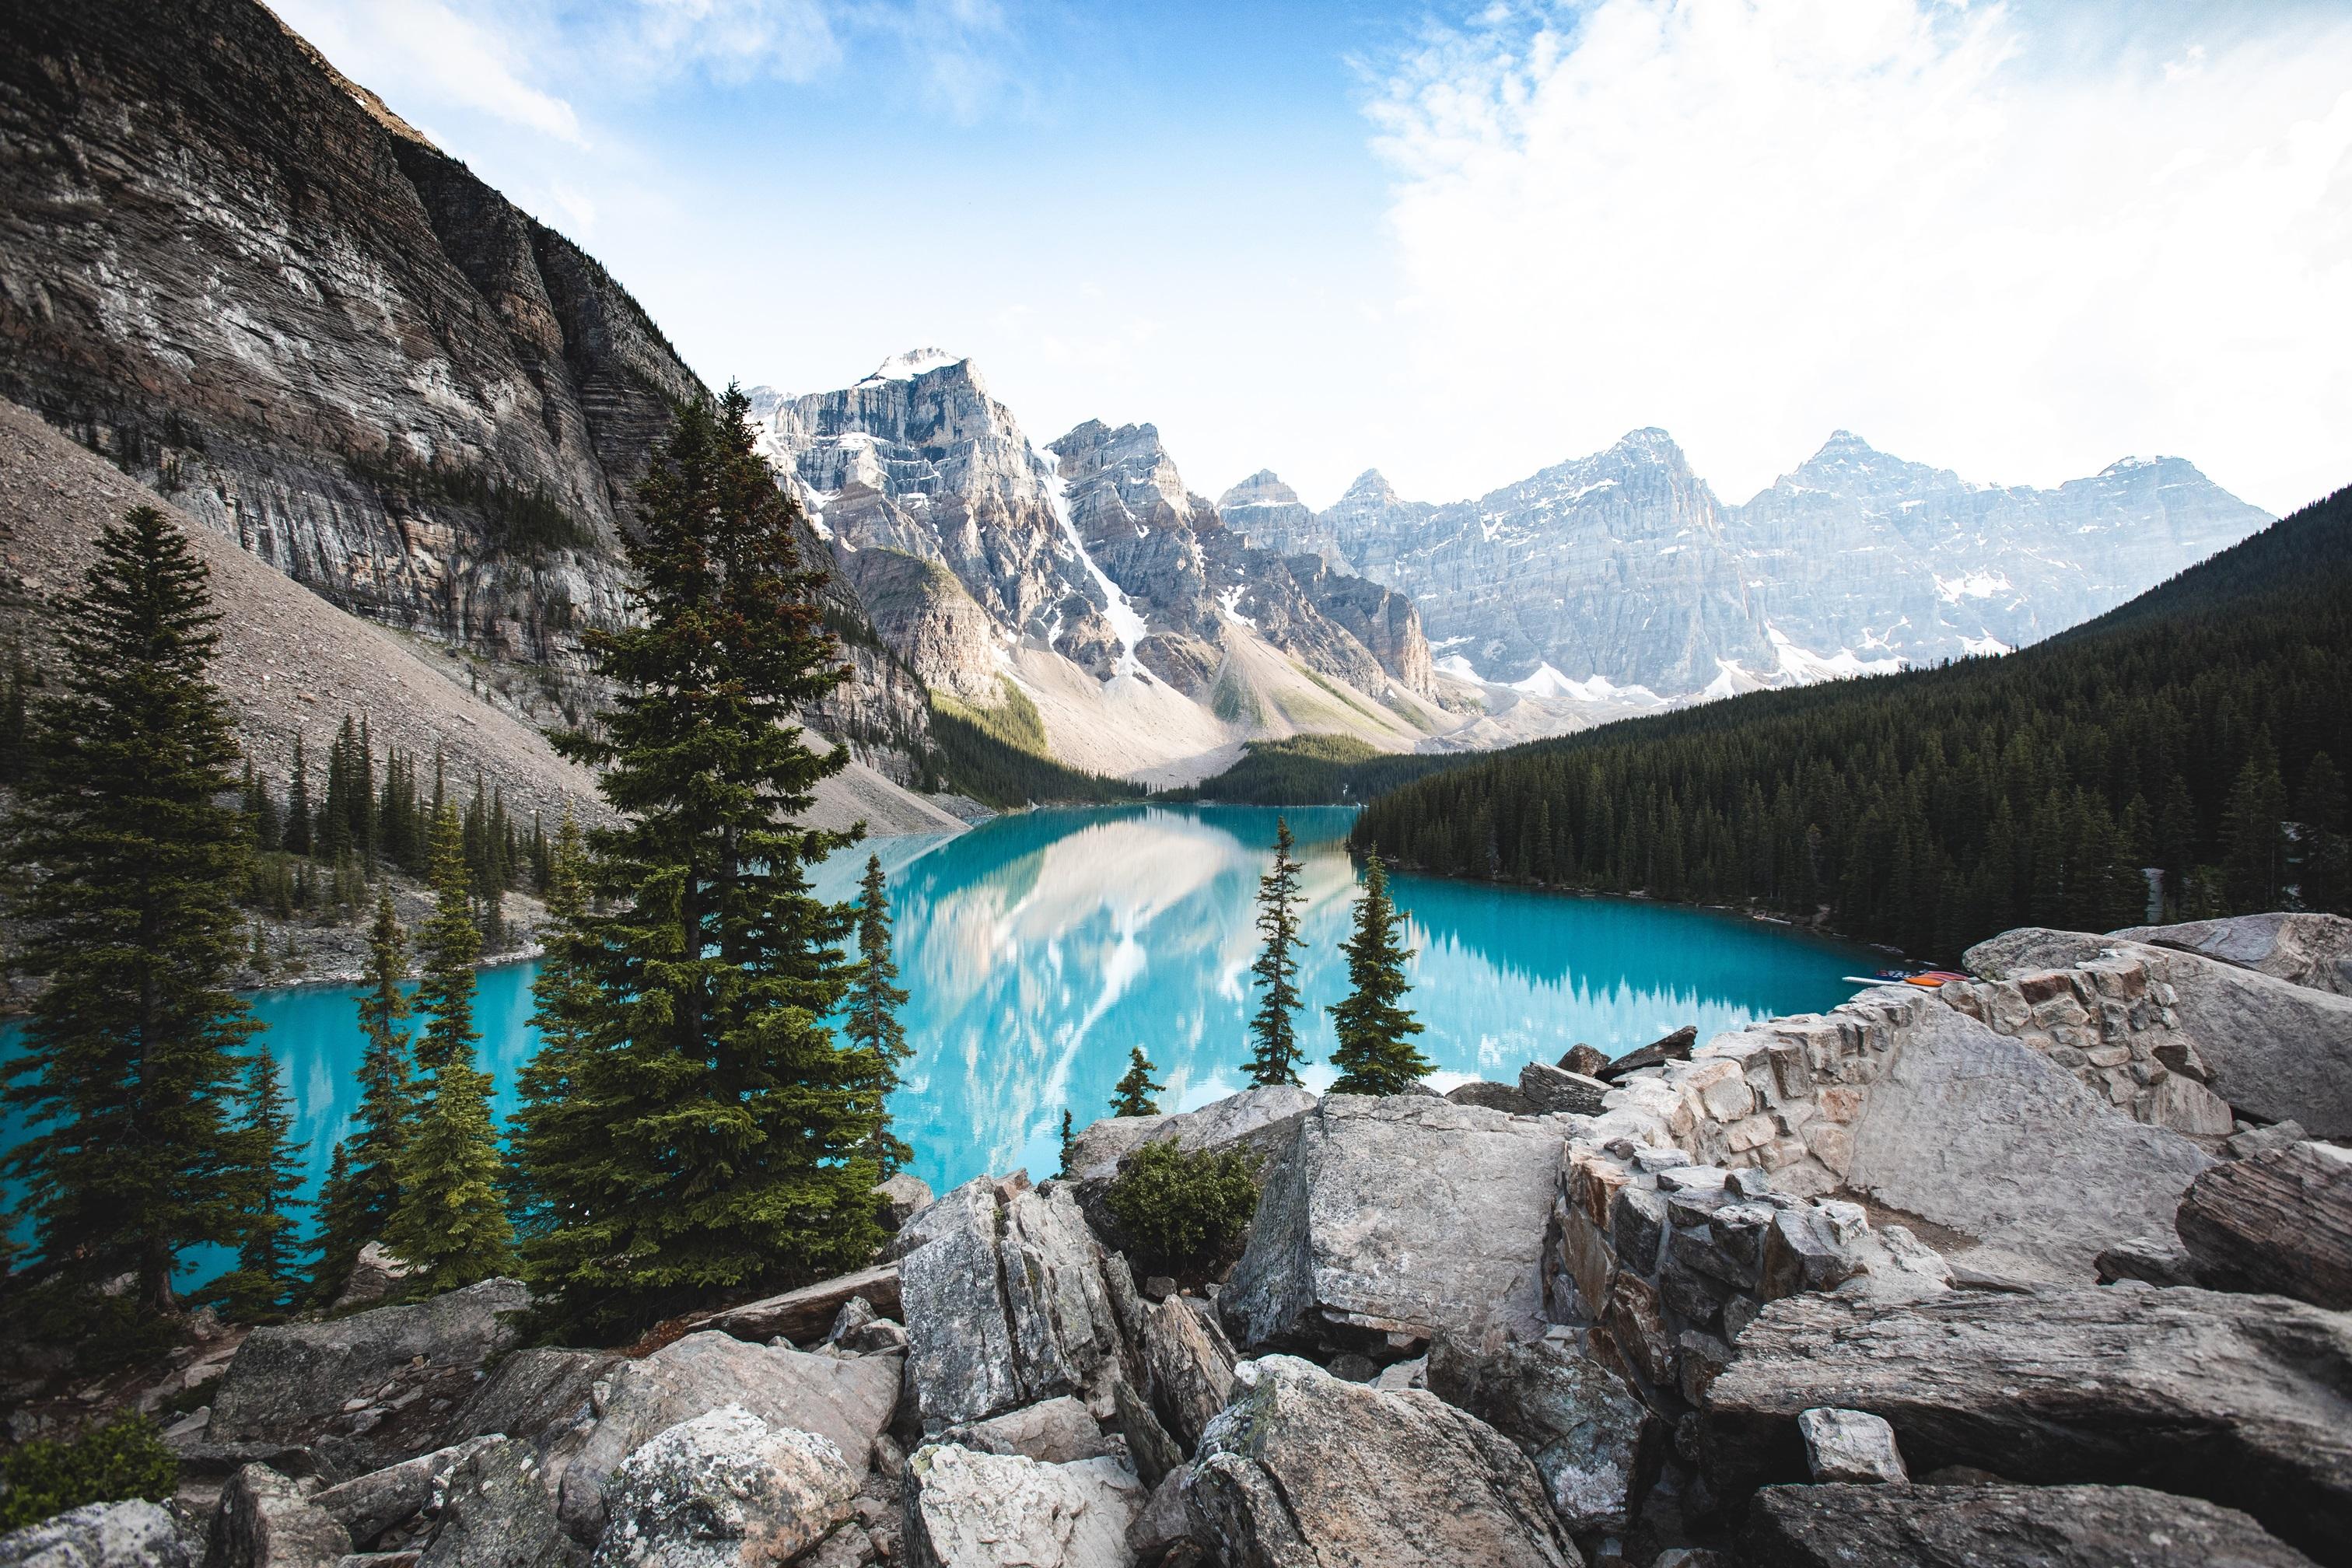 General 3024x2016 landscape nature photography water mountains rock lake Banff Banff National Park Moraine Lake